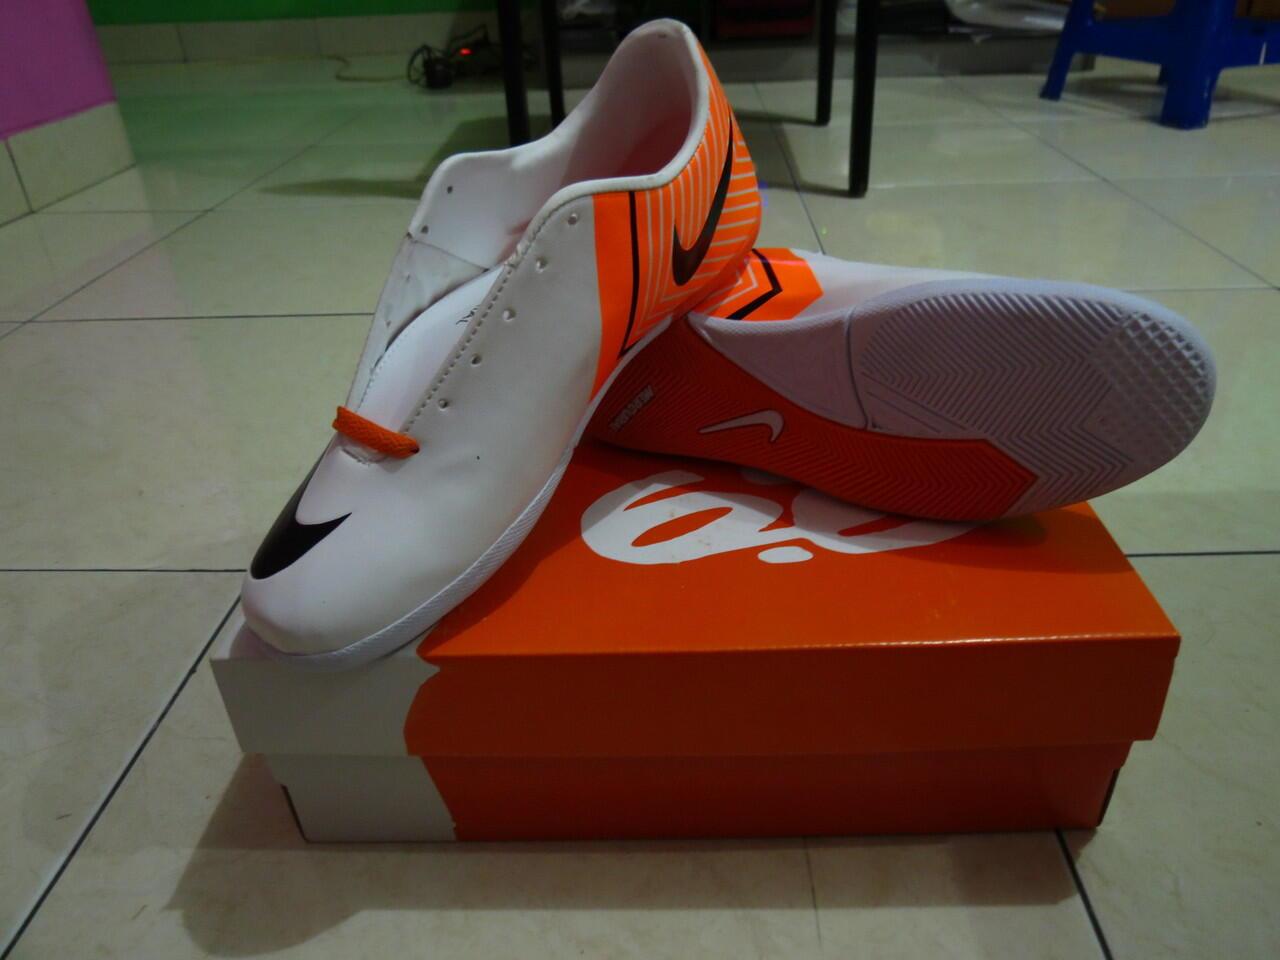 jual sepatu futsal nike hypervenom   nike mercurial kw super made in  vietnam(bandung) ... ea138b649a